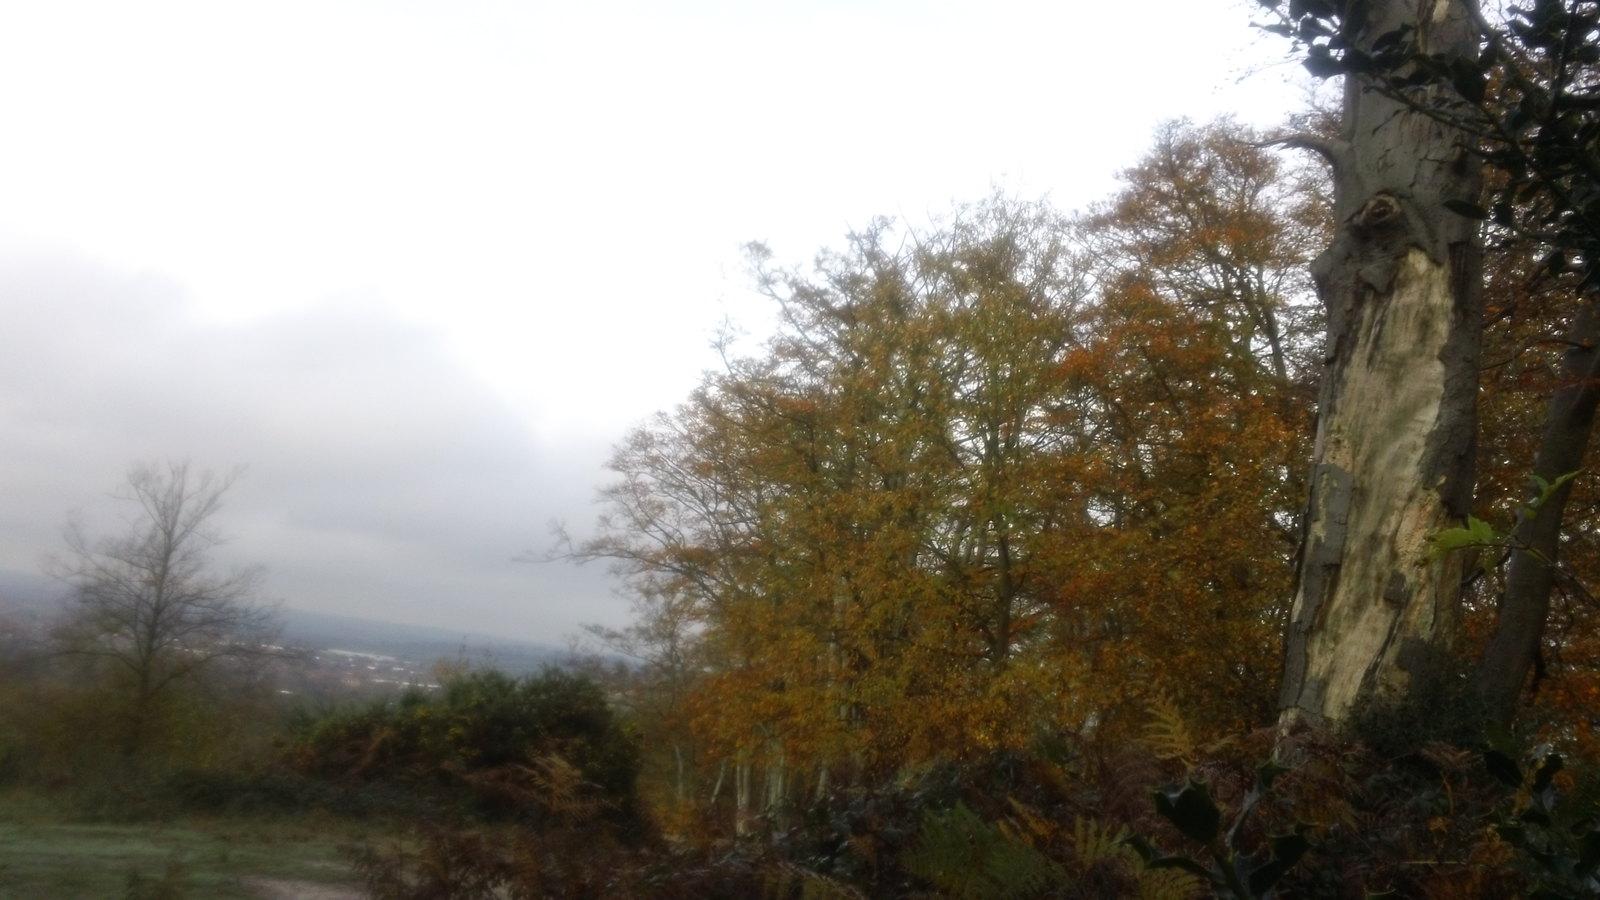 View towards Waltham Cross